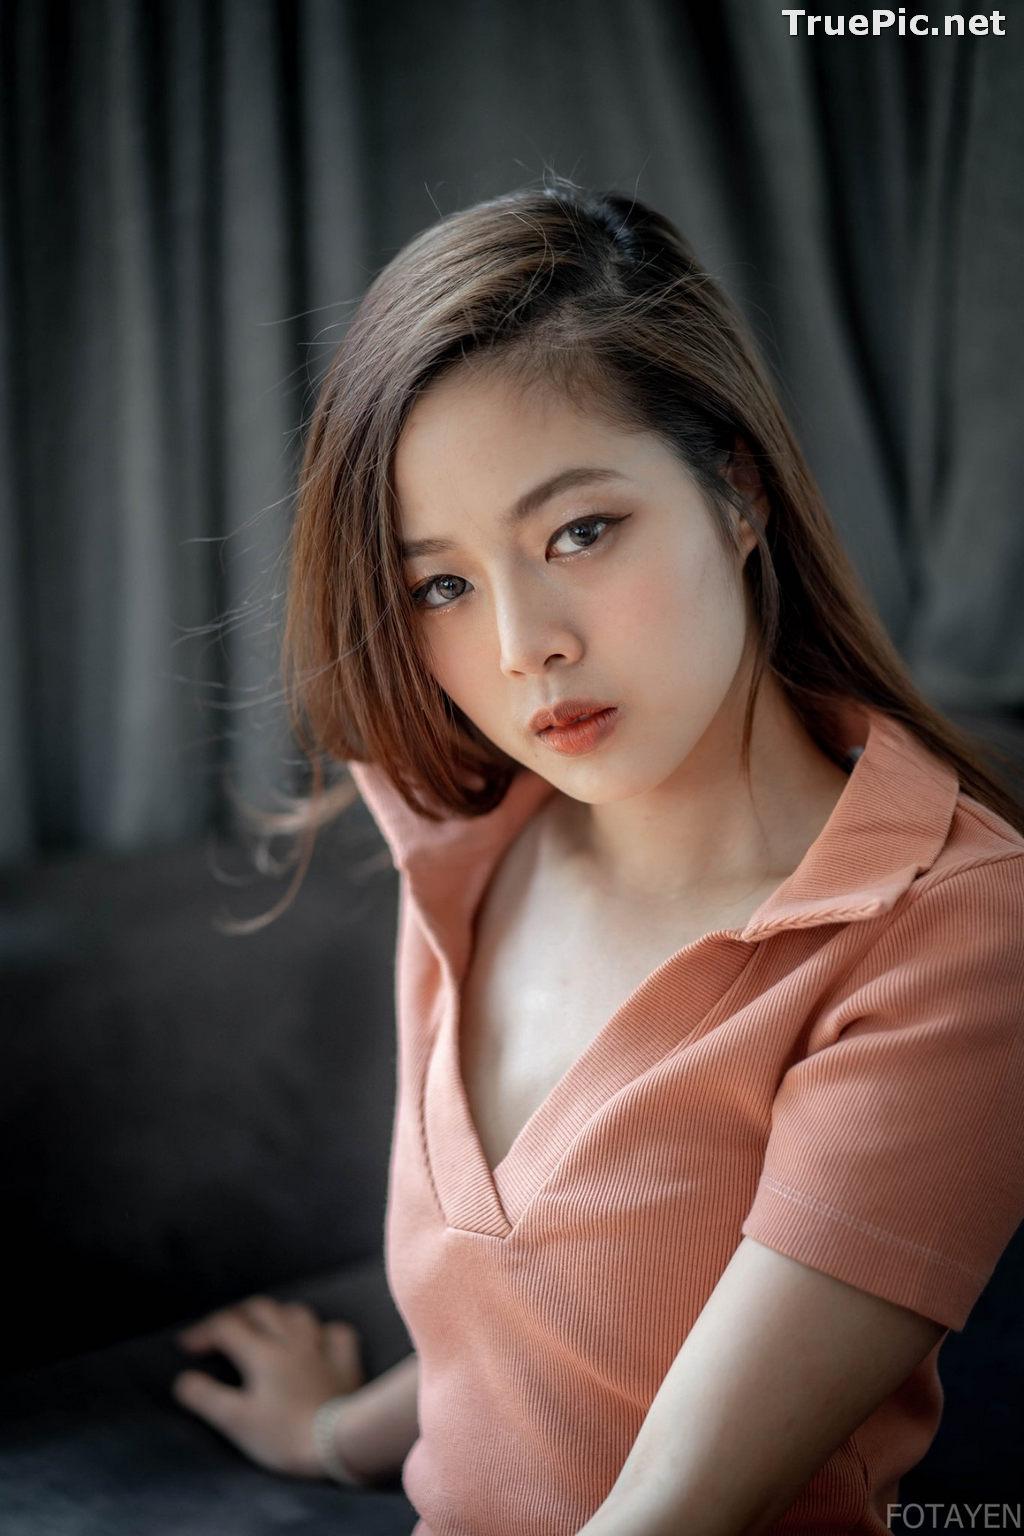 Image Thailand Model - Chanitar Sophawatanon - Pink Lady - TruePic.net - Picture-1